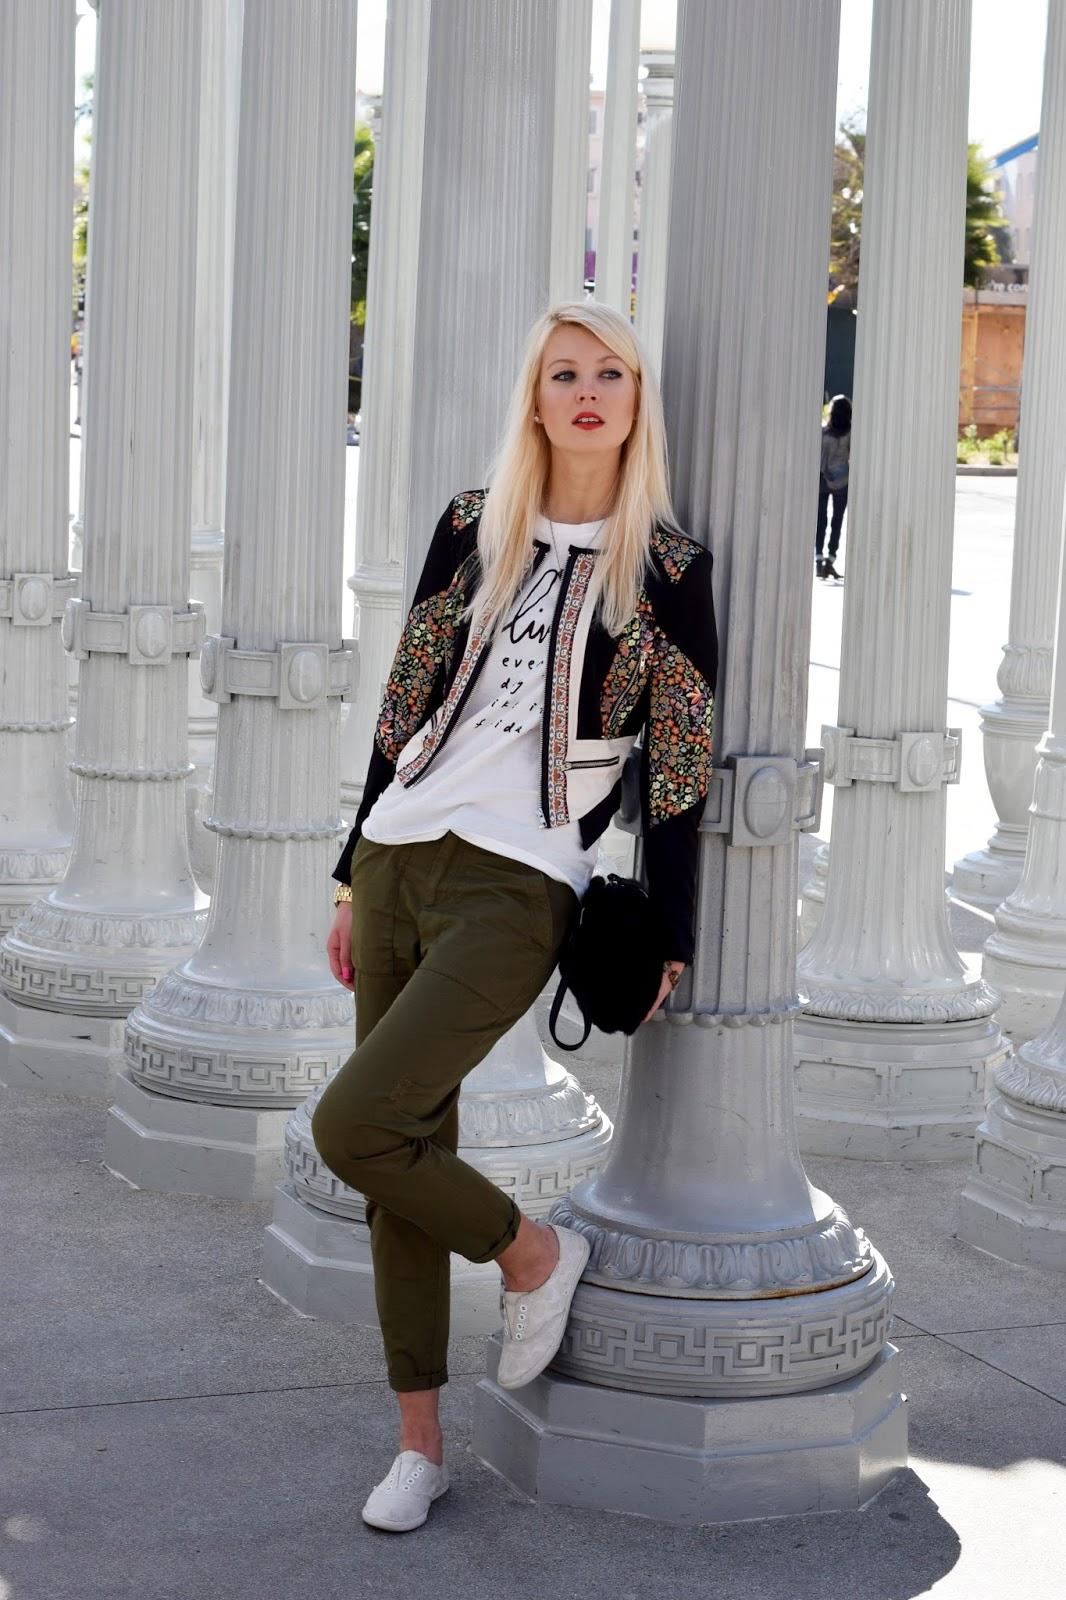 casual look, cargo pants, coach sneakers, printed top, printed tank top, top, shein jacket, shein, floral jacket